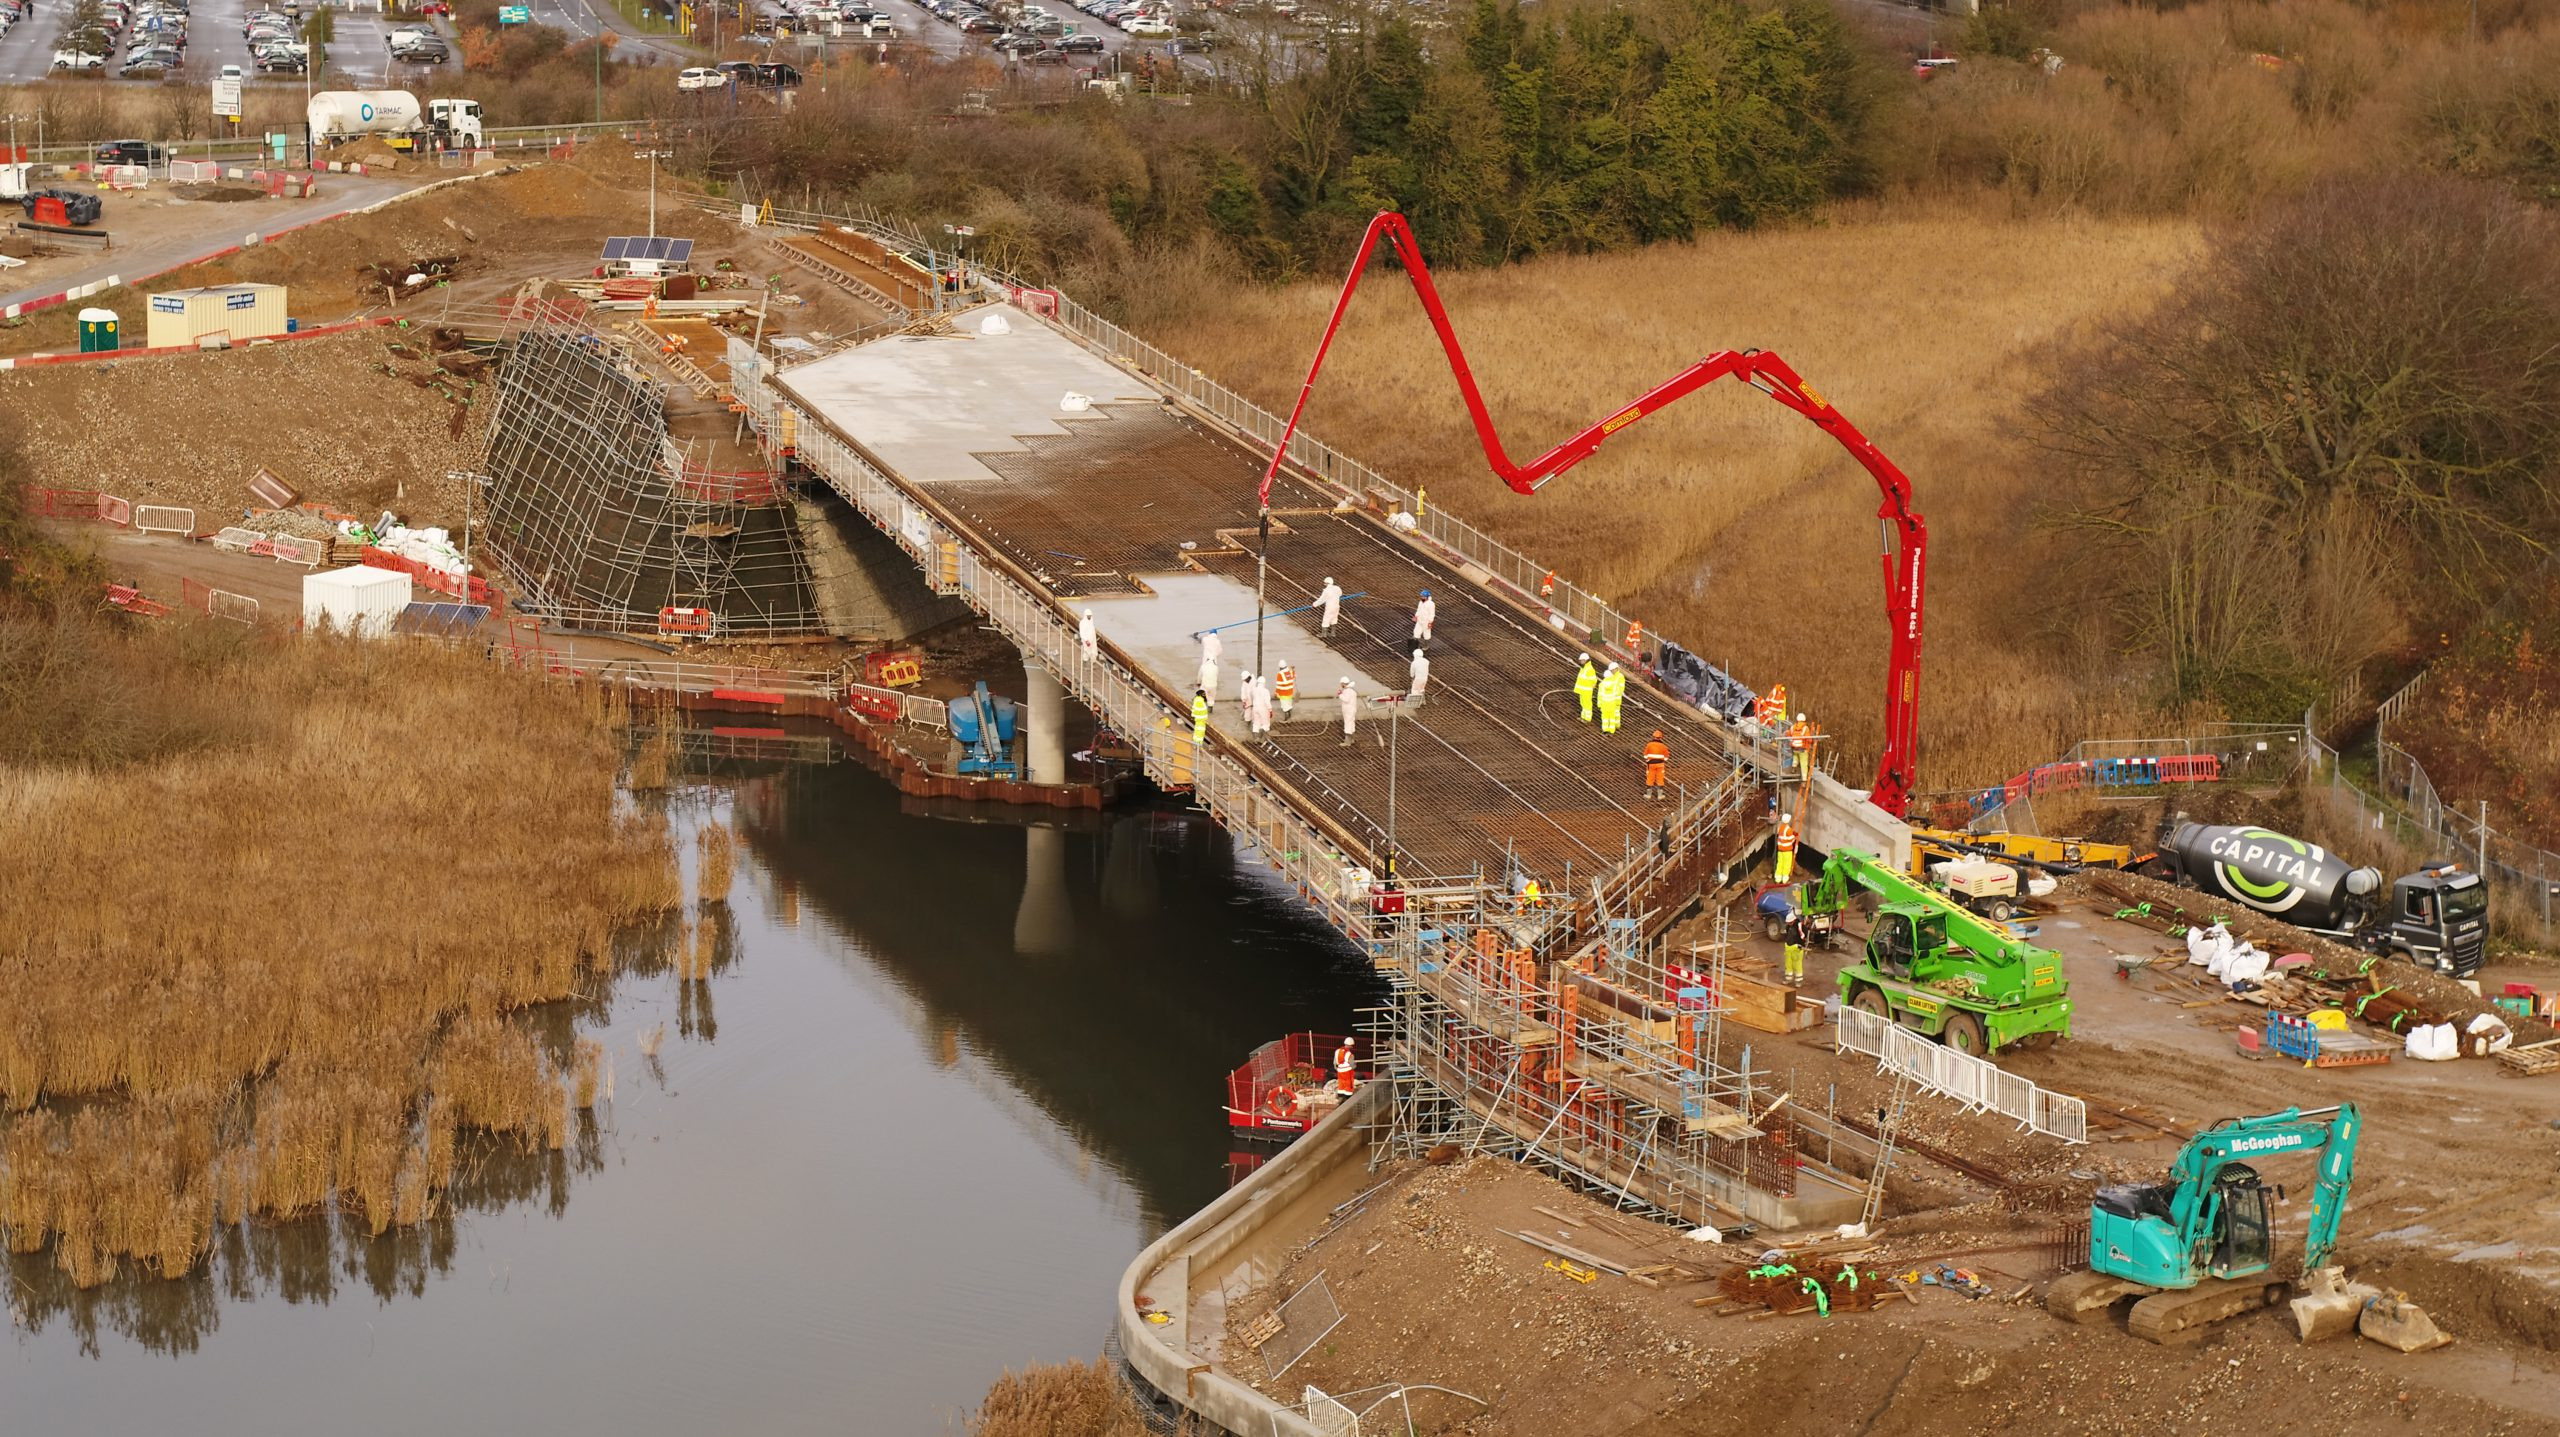 Springhead Bridge with a red crane